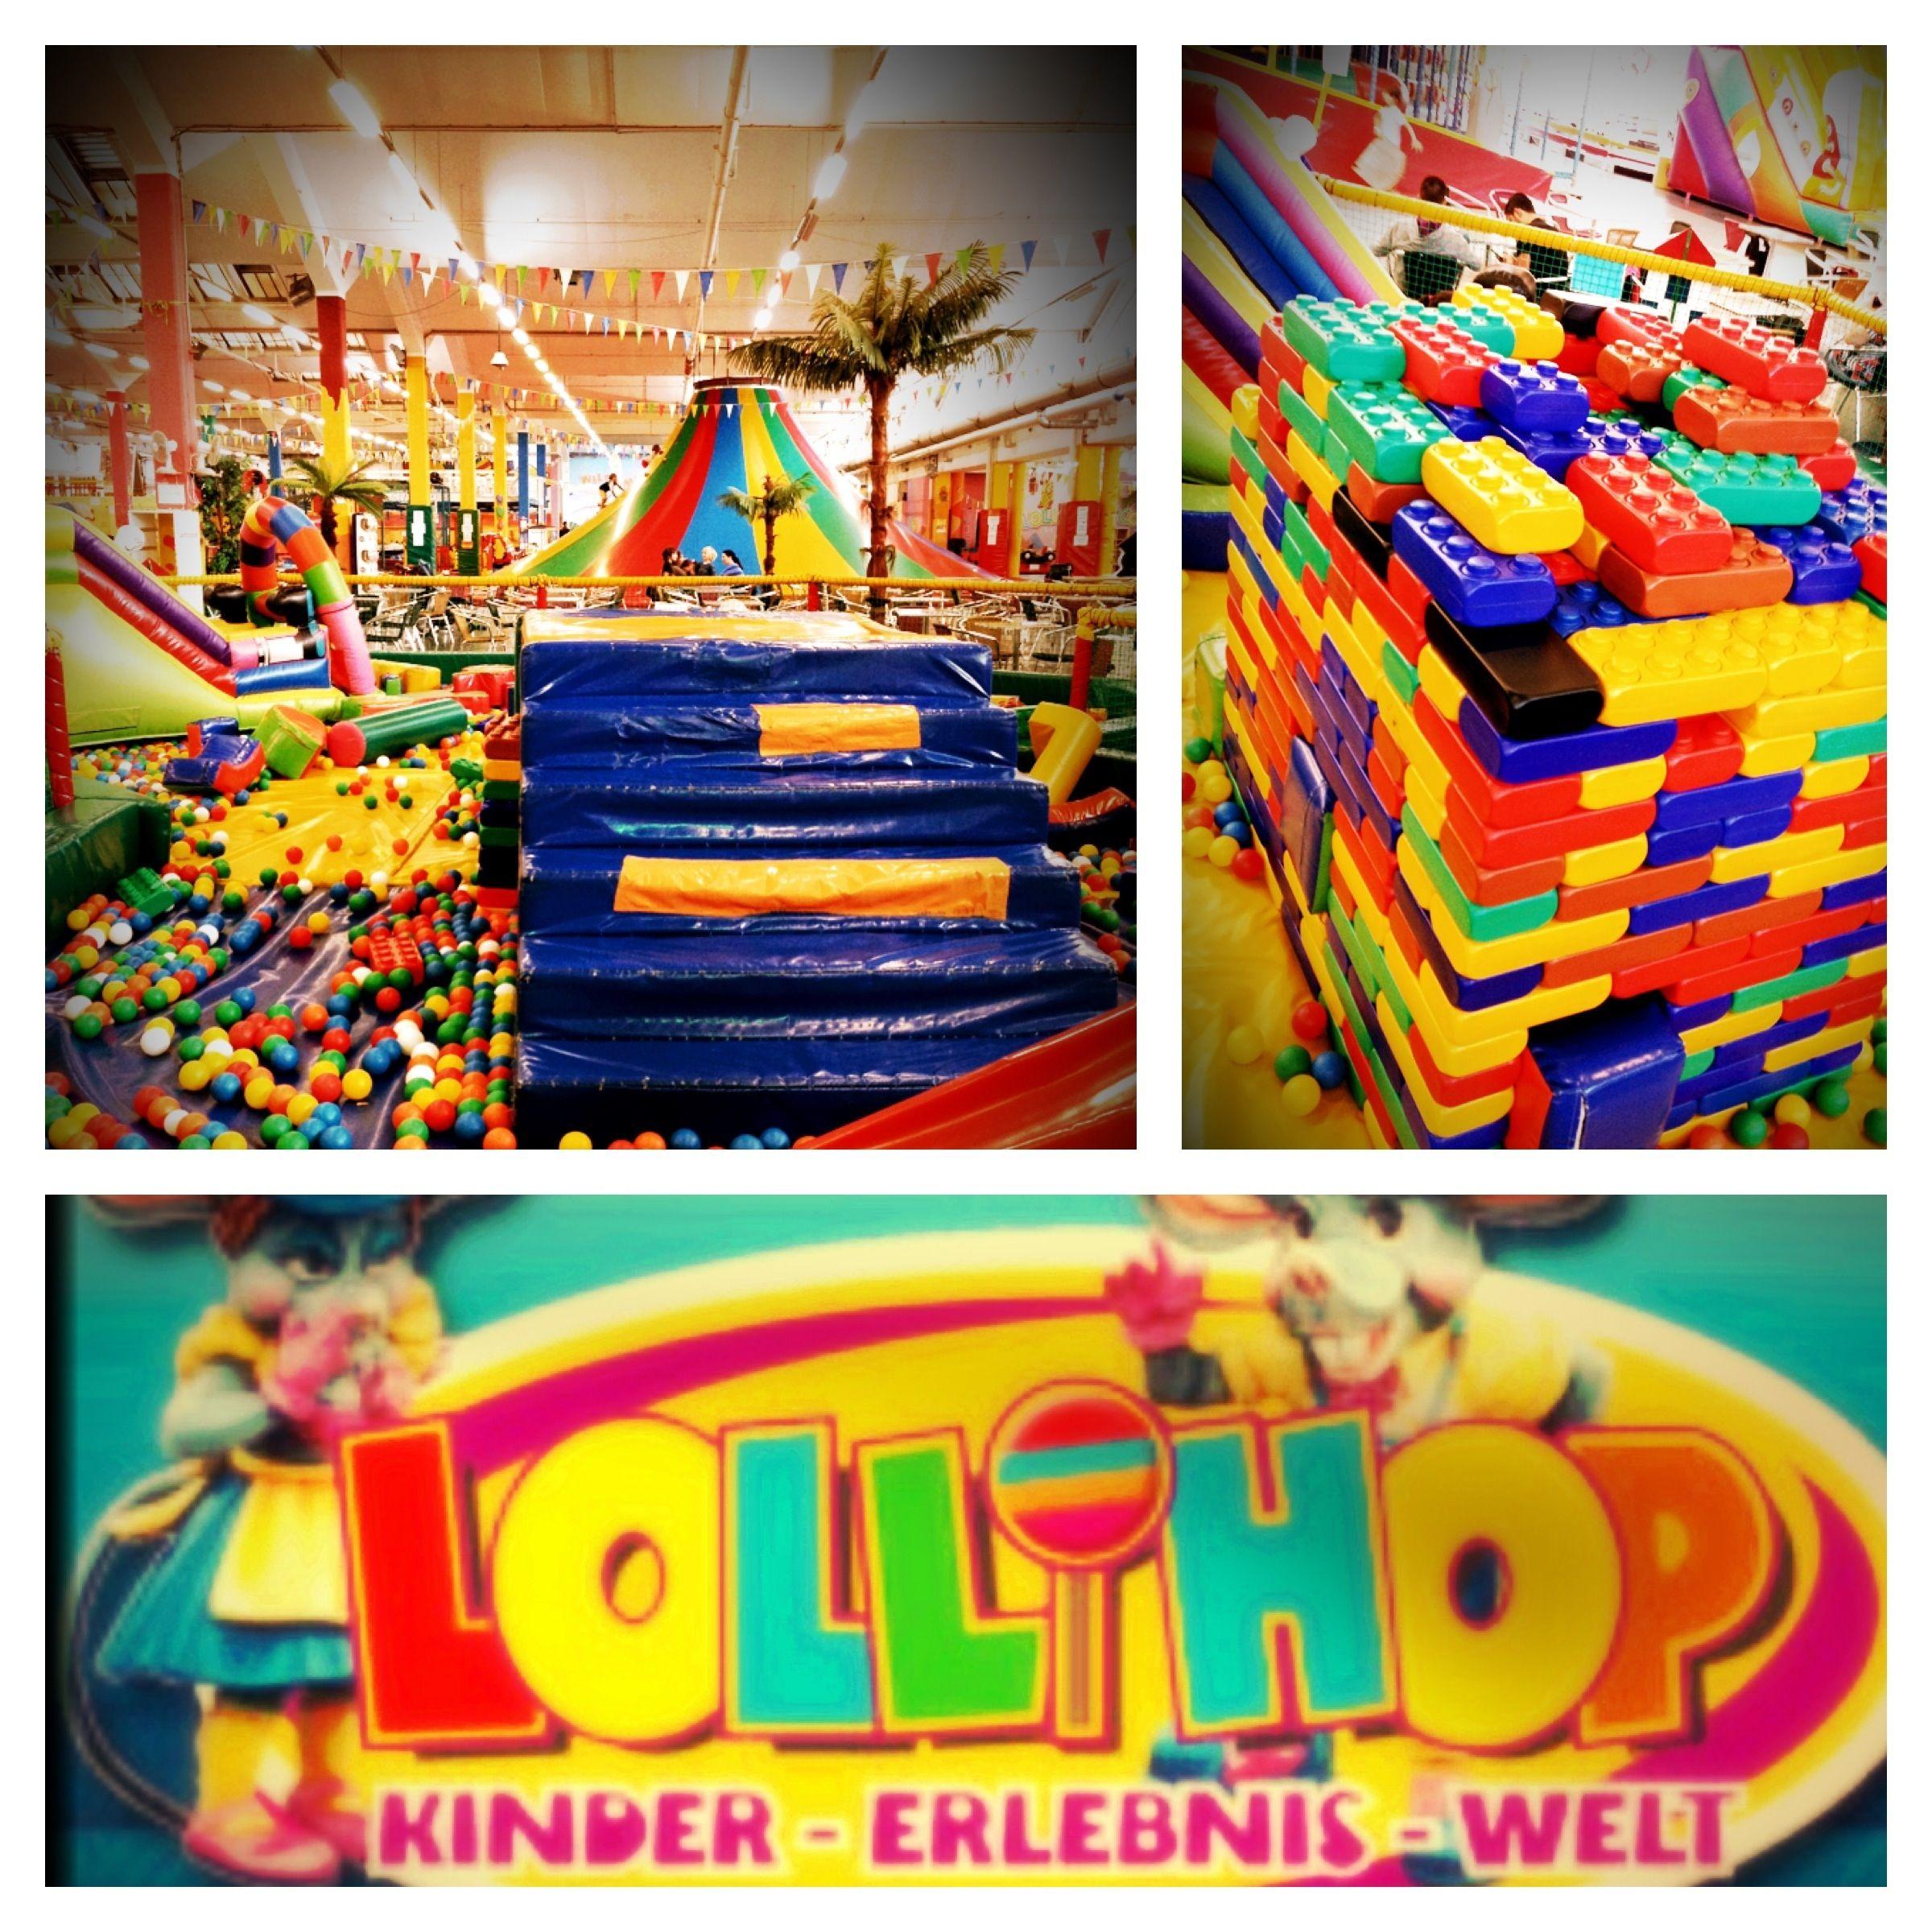 Lollihop Indoorspielplatz, perfektes Ausflugsziel bei schlechtem Wetter.